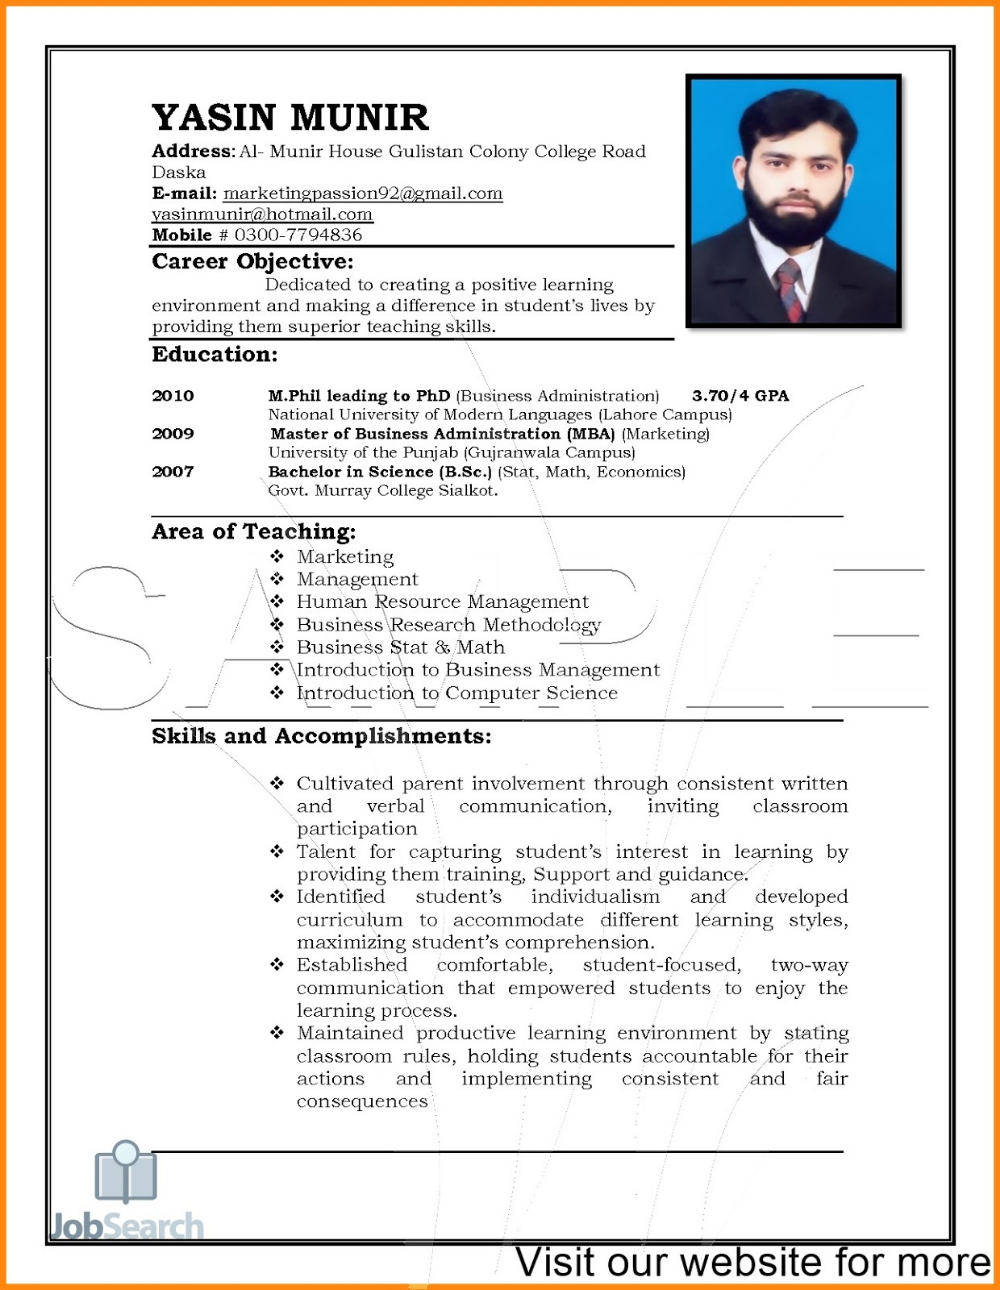 Job Resume Pdf 2020 Job Resume For Freshers In 2020 Job Resume